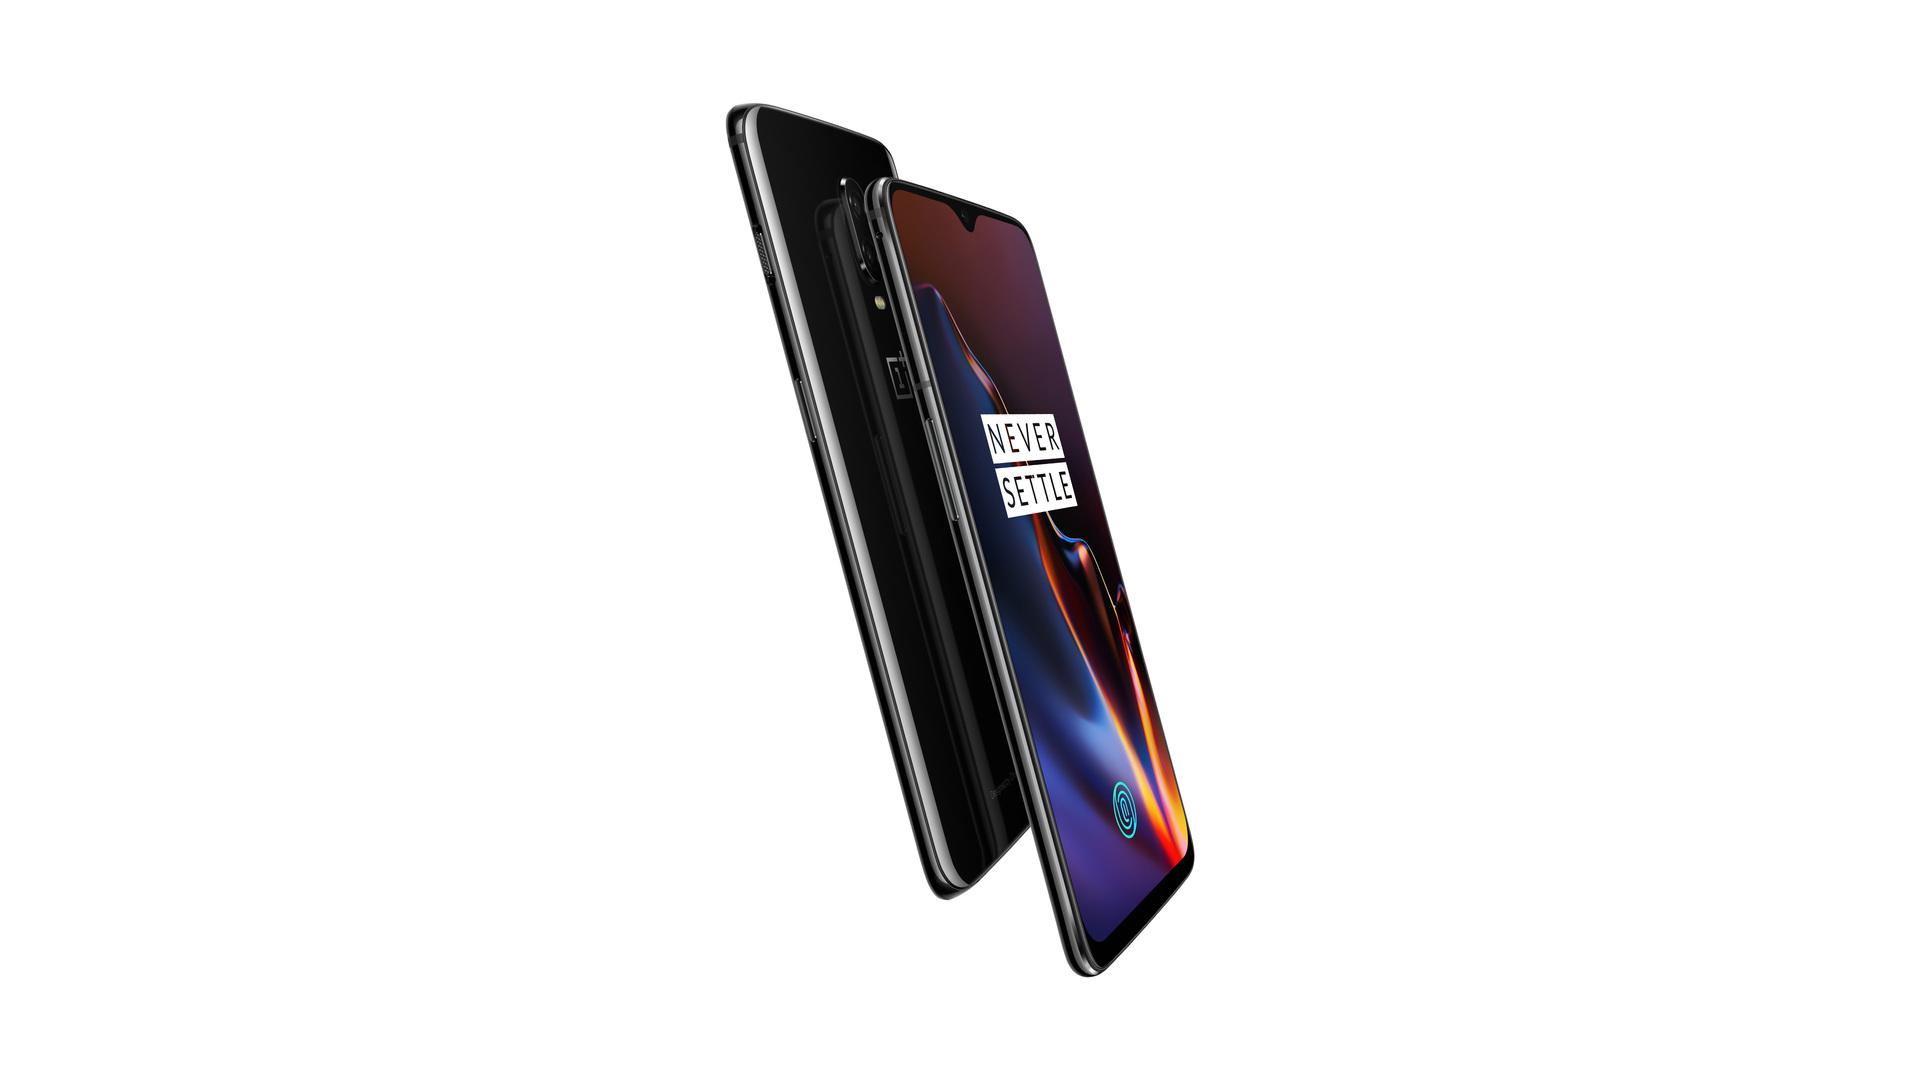 OnePlus-6T-teardrop-display